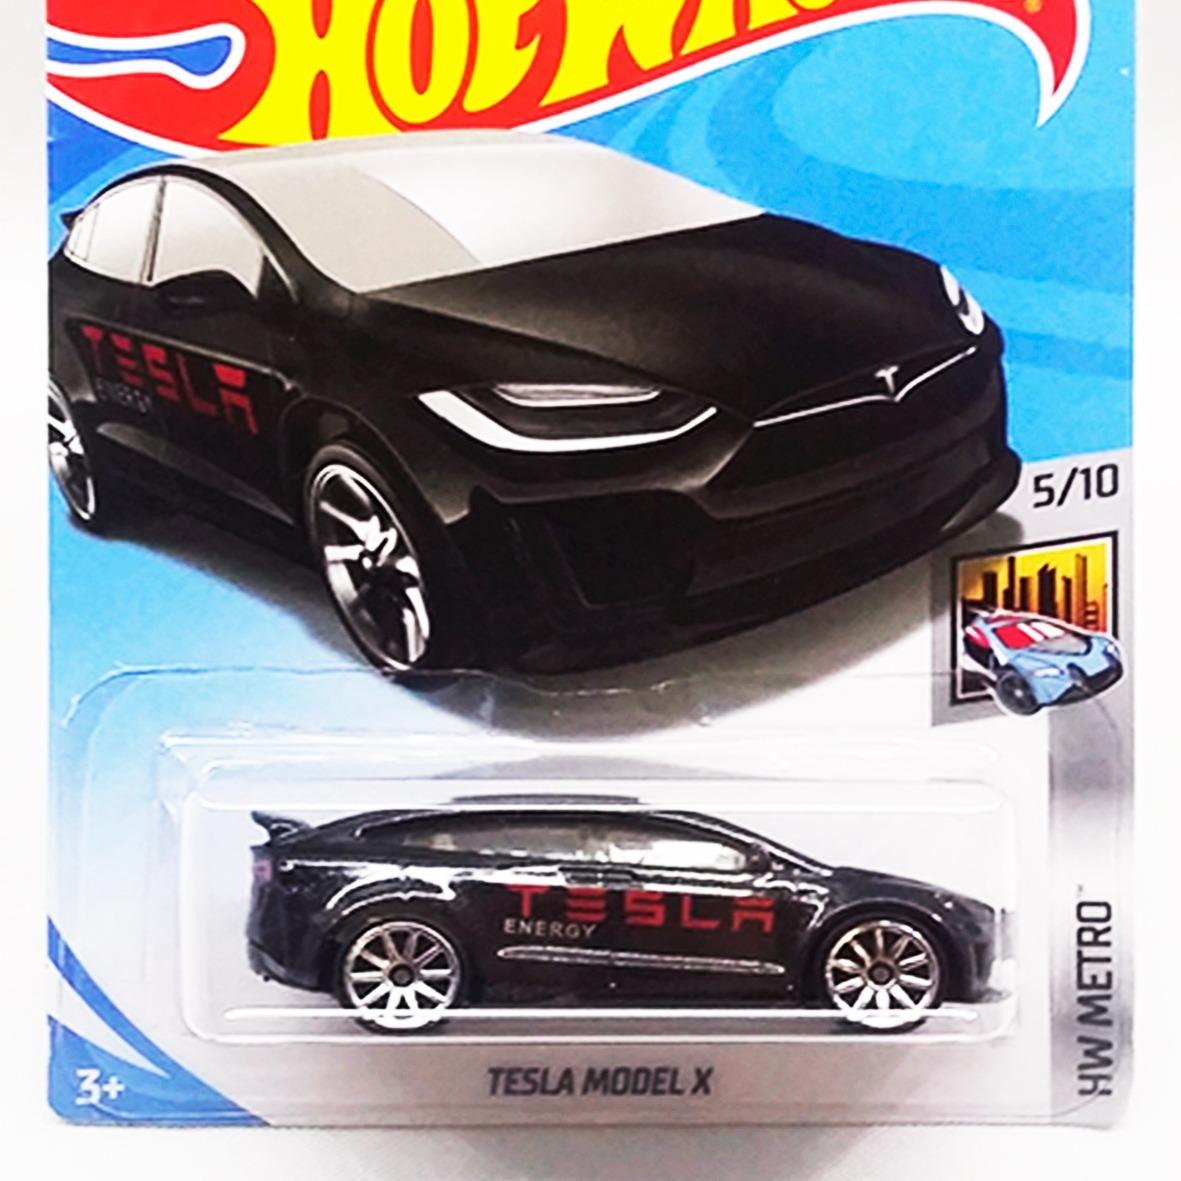 Tarjeta de Tesla modelo X hot wheels Metro